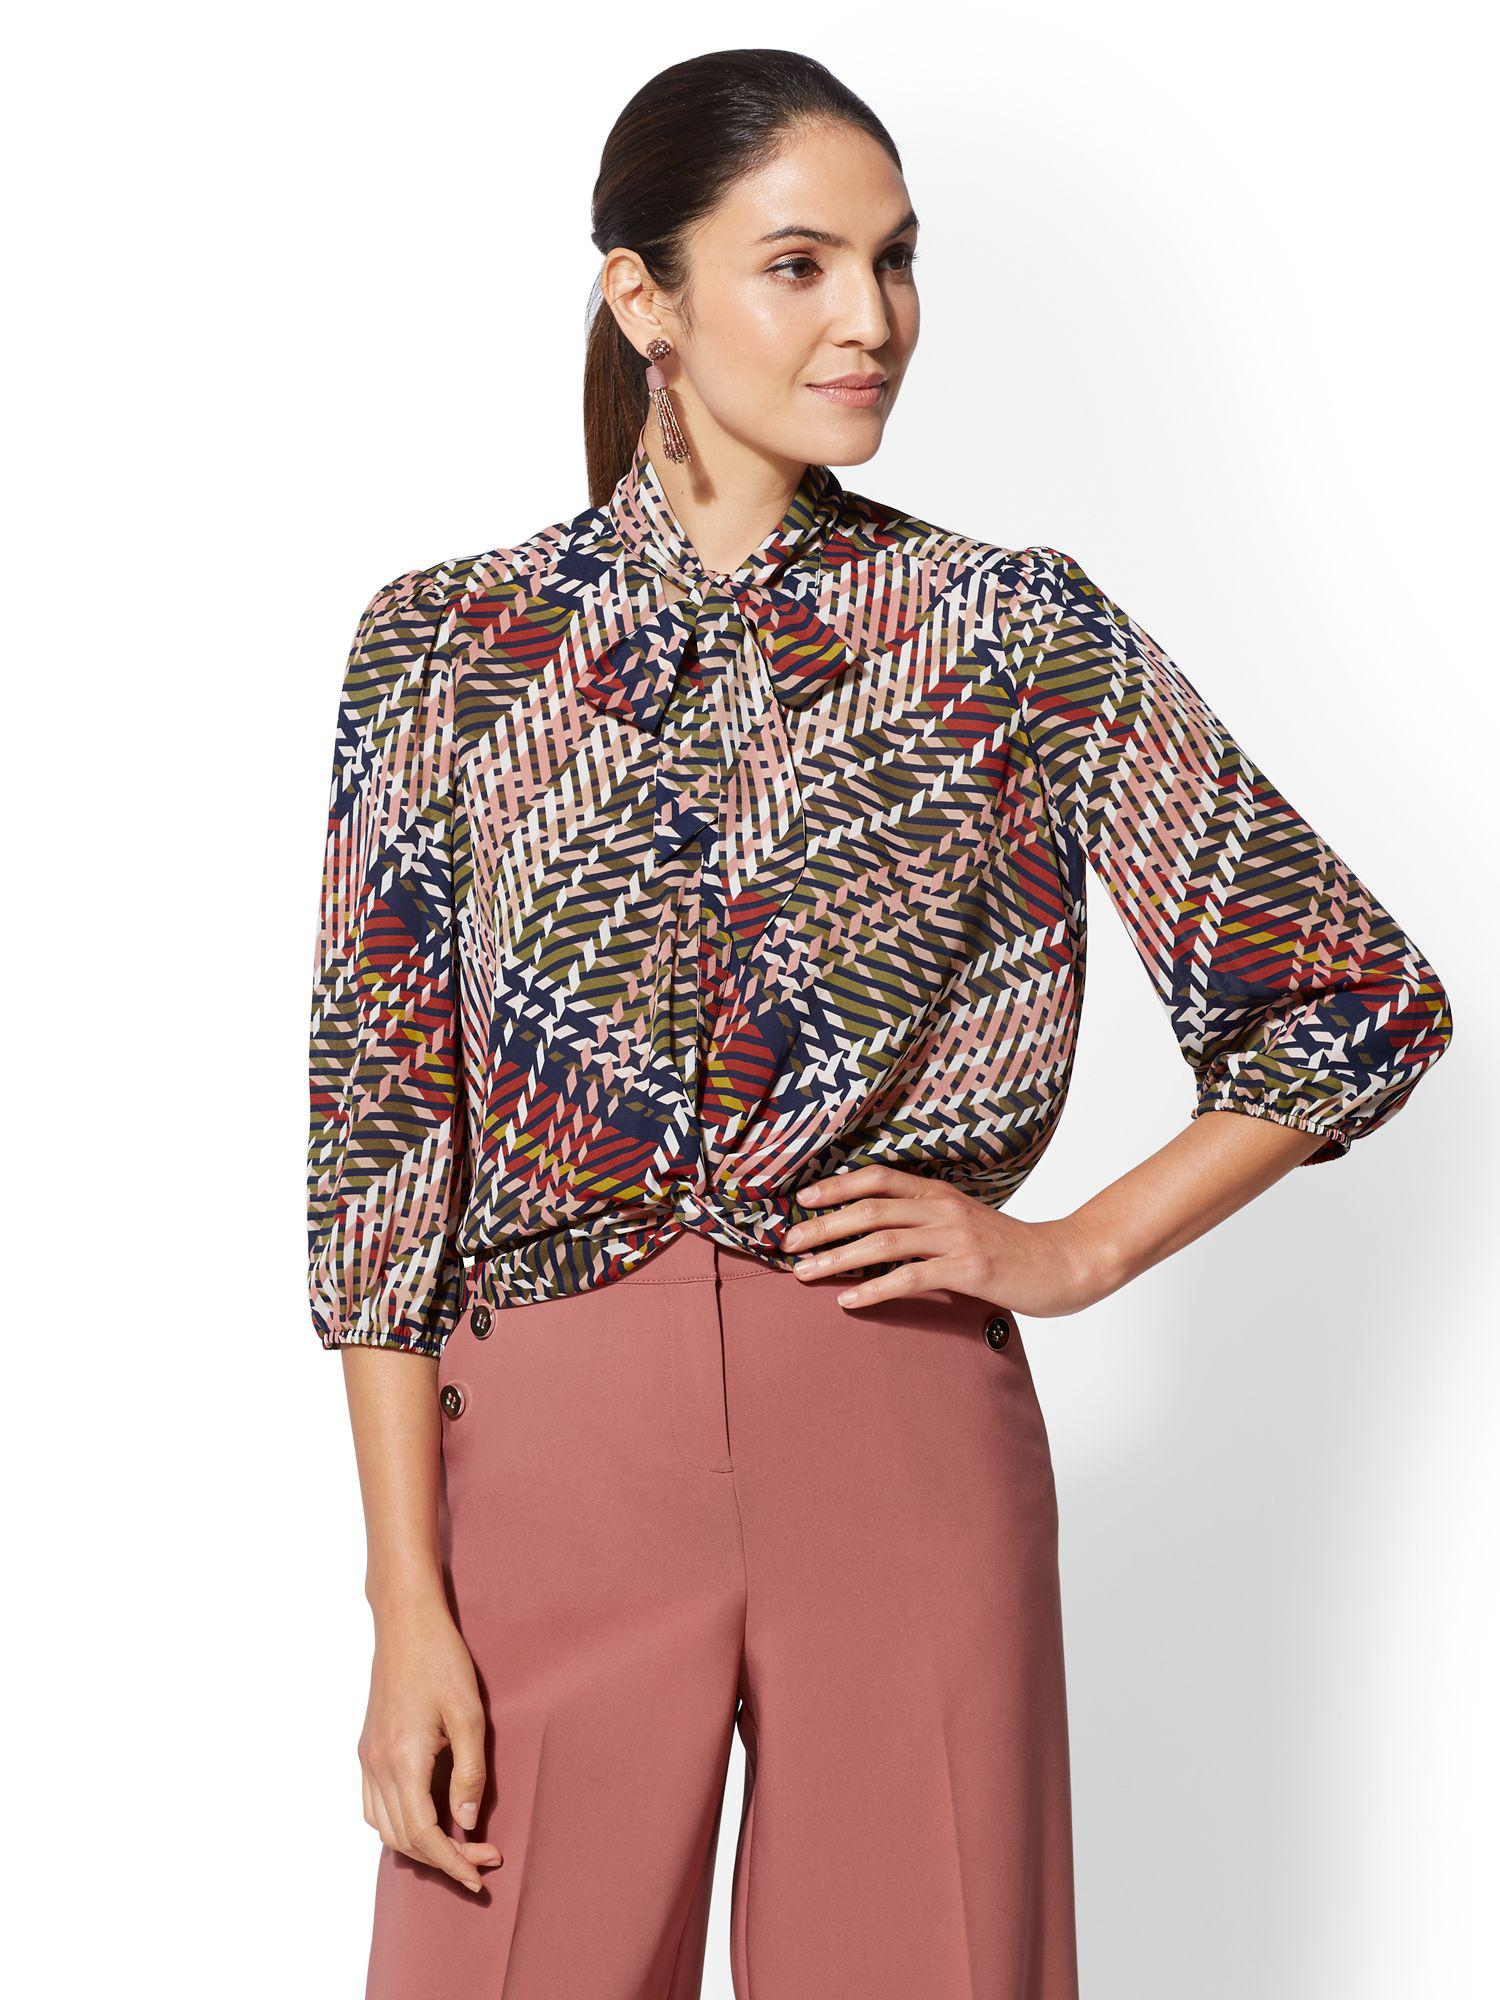 423fbad9df7d46 New York & Company 7th Avenue - Petite Twist-front Tie-neck Blouse ...